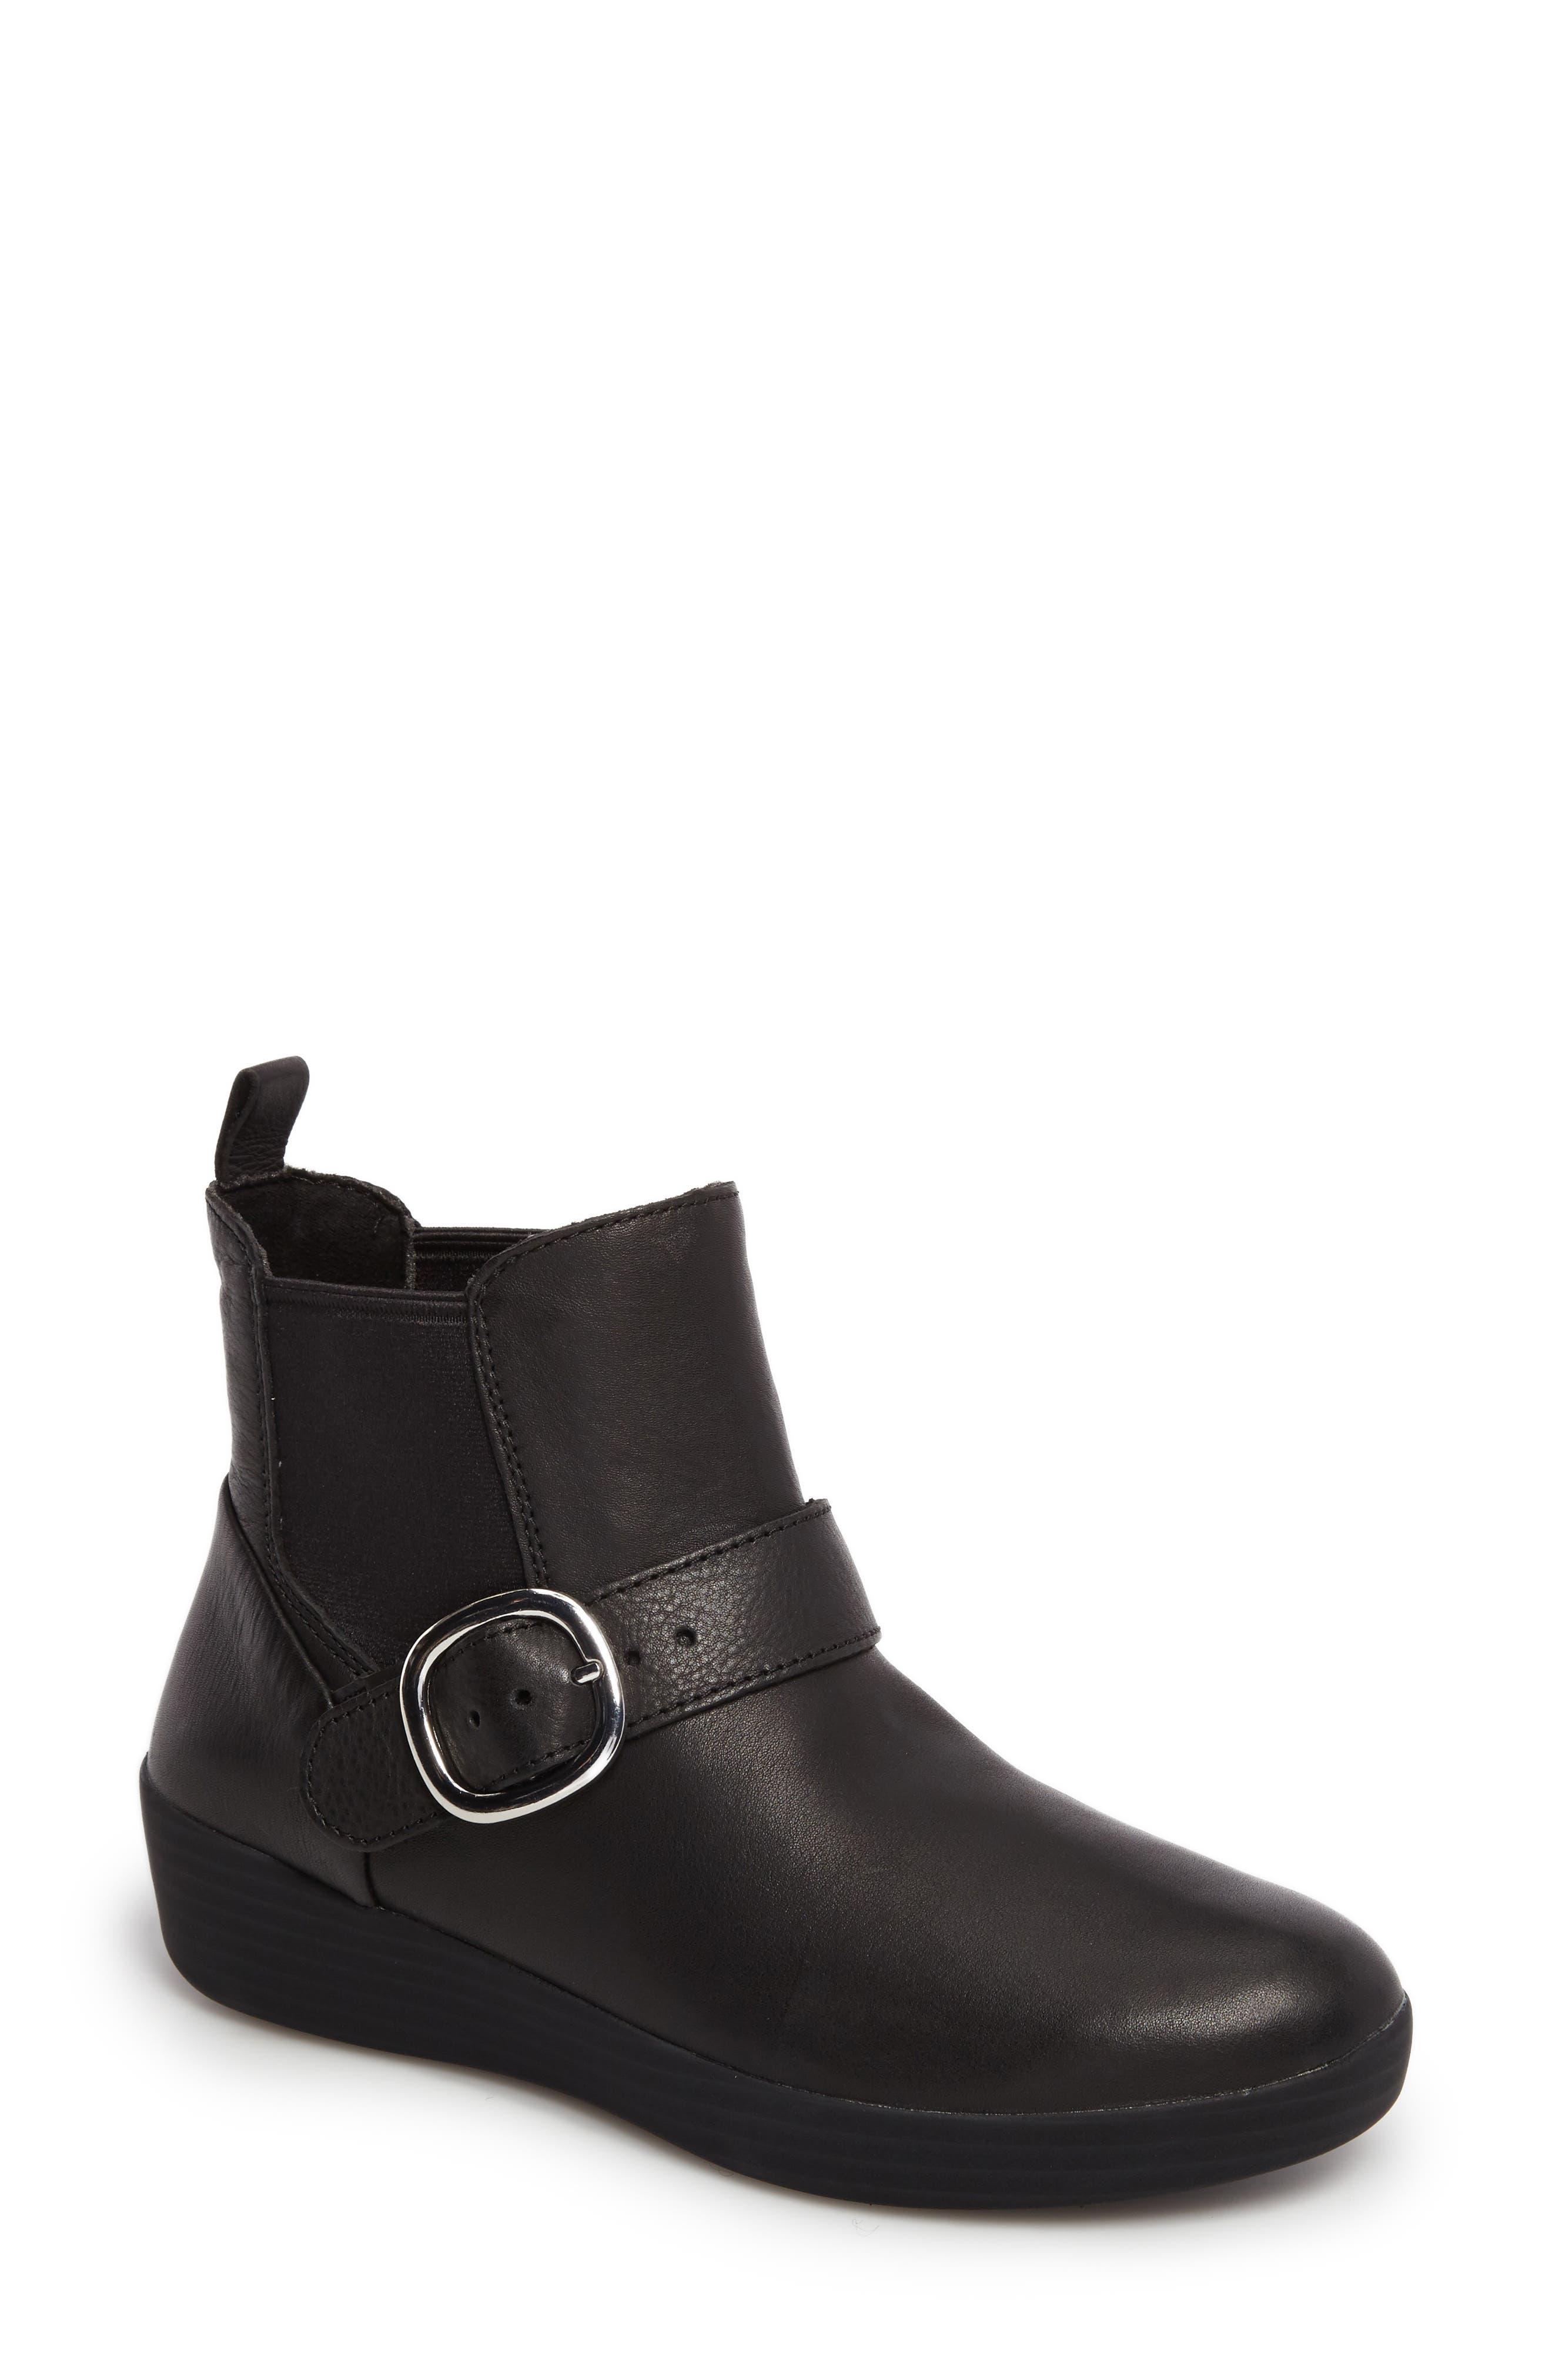 Superbuckle Chelsea Boot,                             Main thumbnail 1, color,                             Black